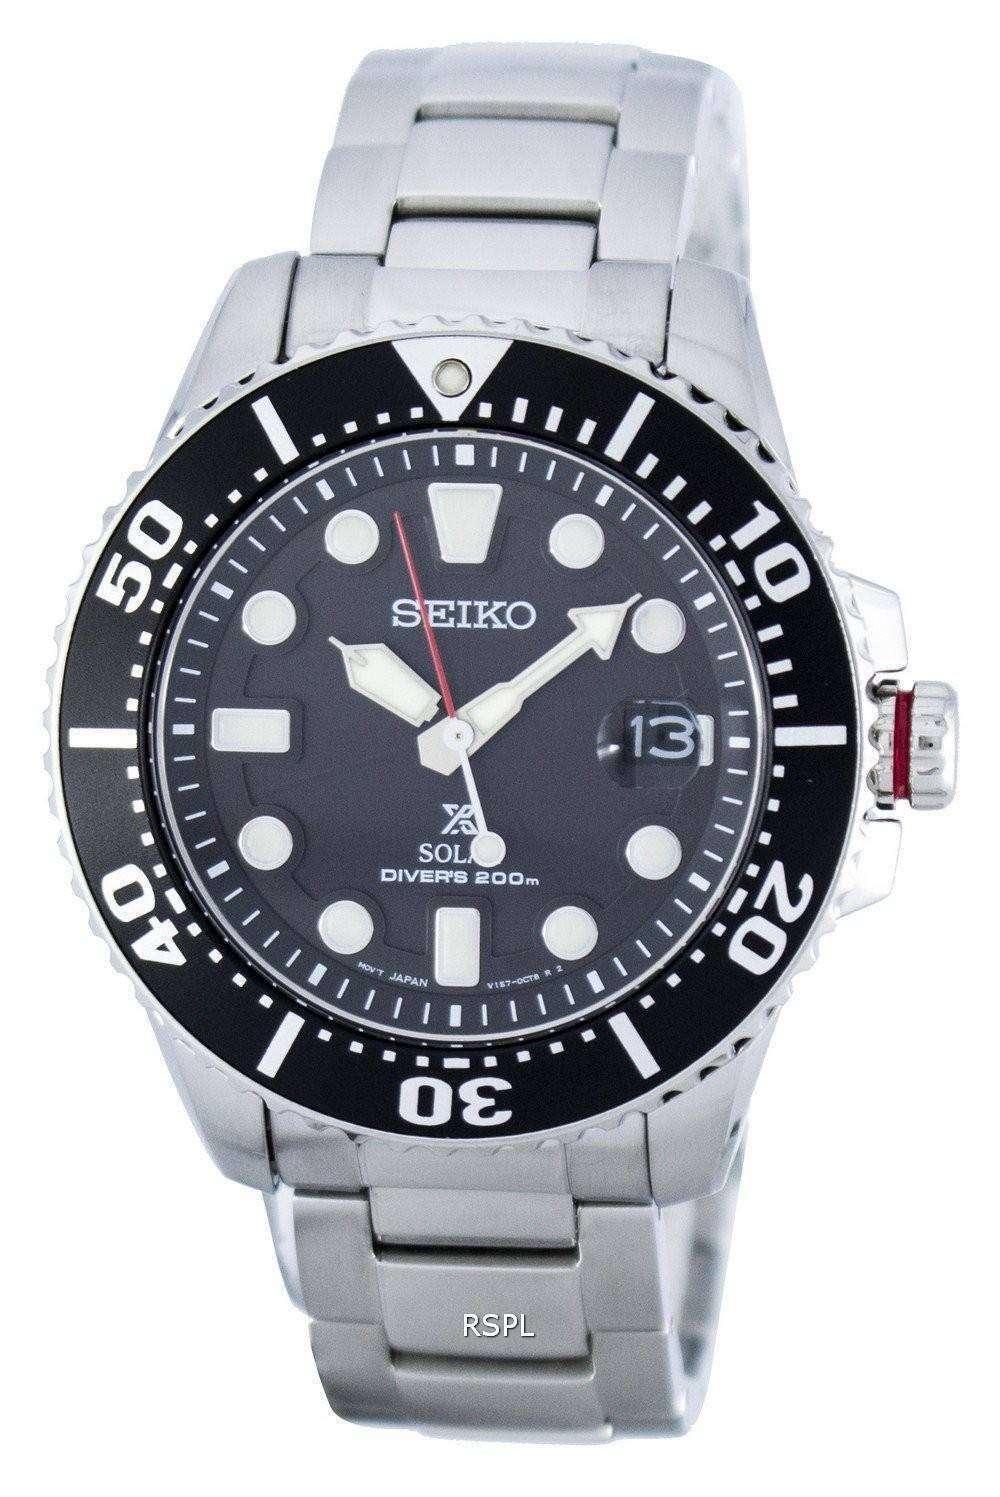 seiko prospex solar diver 39 s 200m sne437 sne437p1 sne437p men 39 s watch. Black Bedroom Furniture Sets. Home Design Ideas